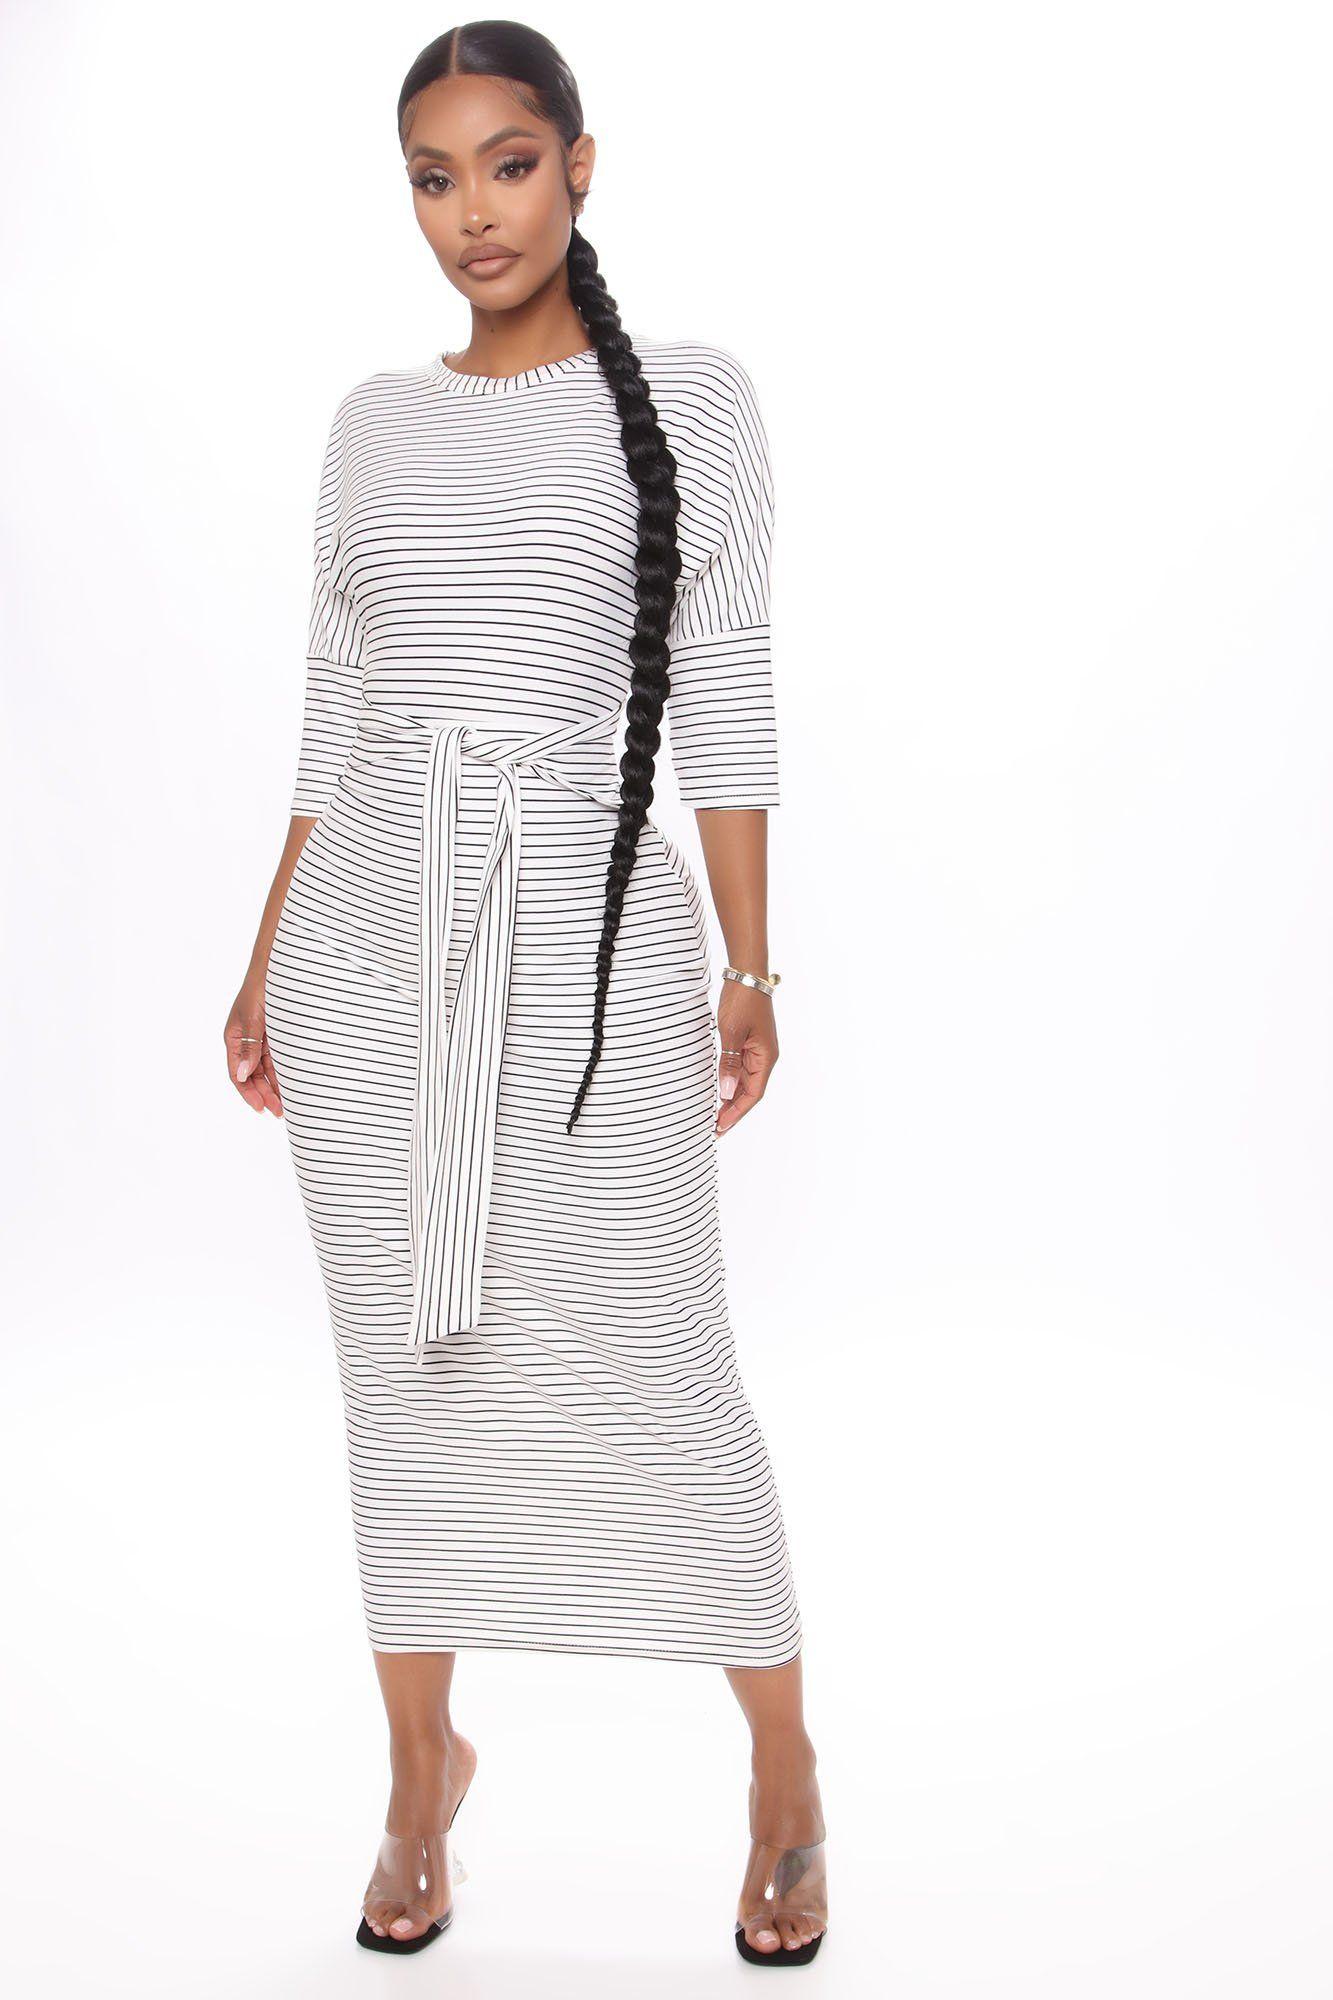 Tied Lines Striped Midi Dress White Black In 2021 White Midi Dress African Fashion Skirts Striped Midi Dress [ 2000 x 1333 Pixel ]